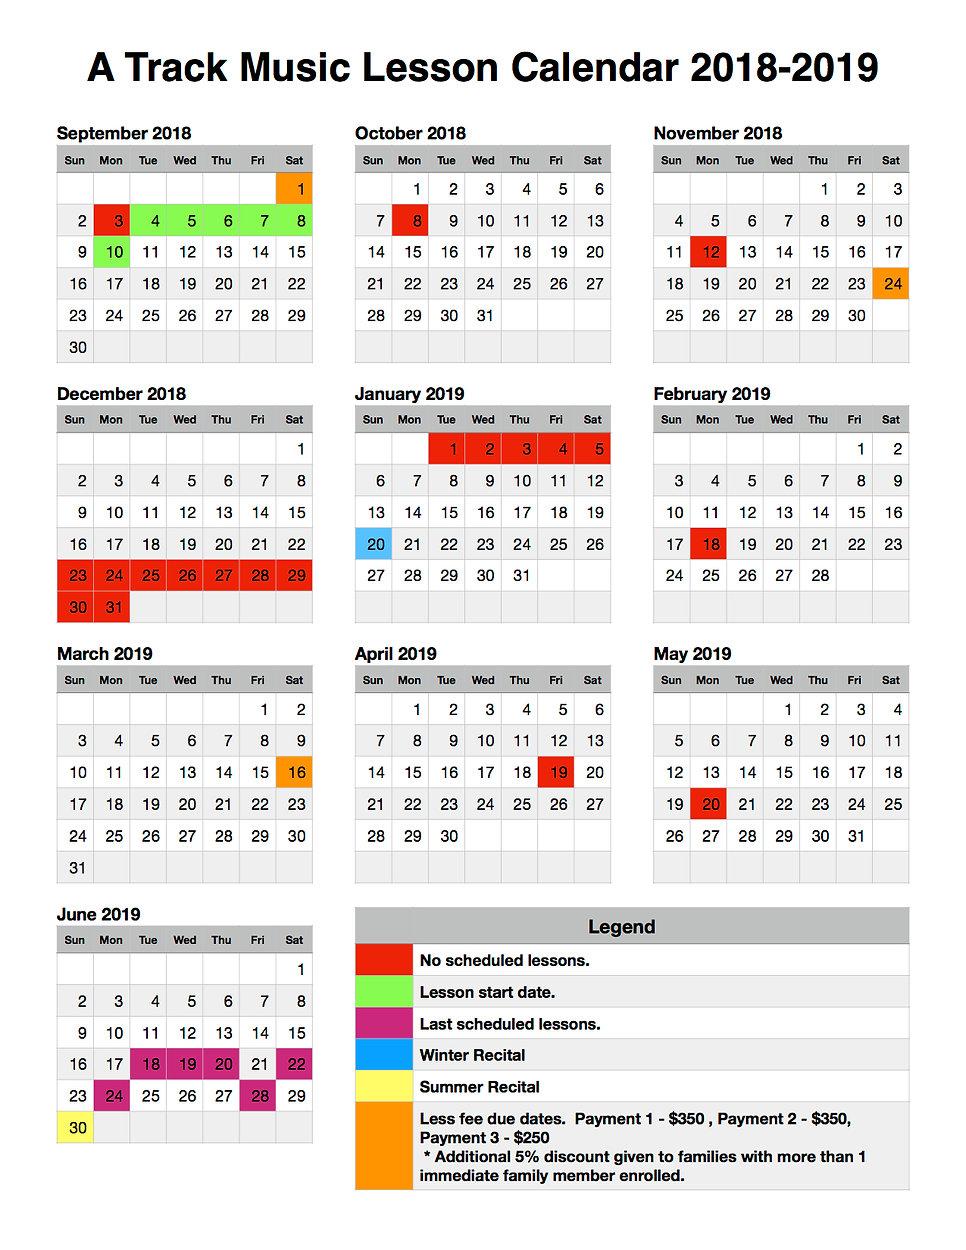 A Track Music Lesson Calendar 2018-2019.